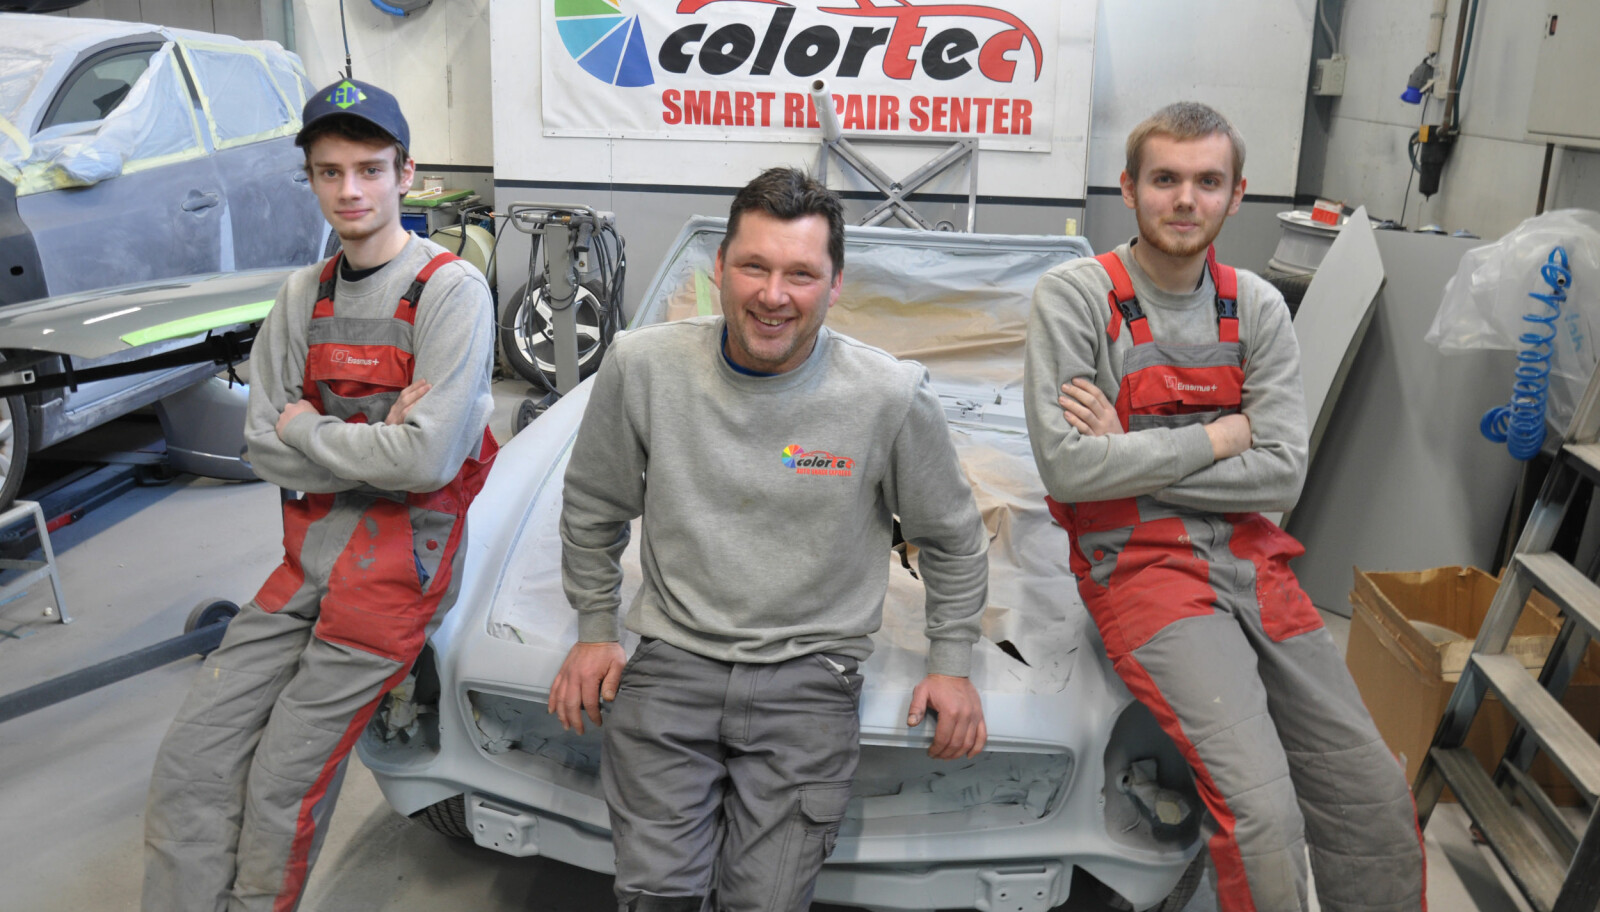 Pål Møklegård i billakkeringsfirmaet Colortec i Fredrikstad er godt fornøyd med lærlingene han har fått via Erasmus+. Til venstre Raner Ruusalep (20) og på høyre side Markus Notta (18).